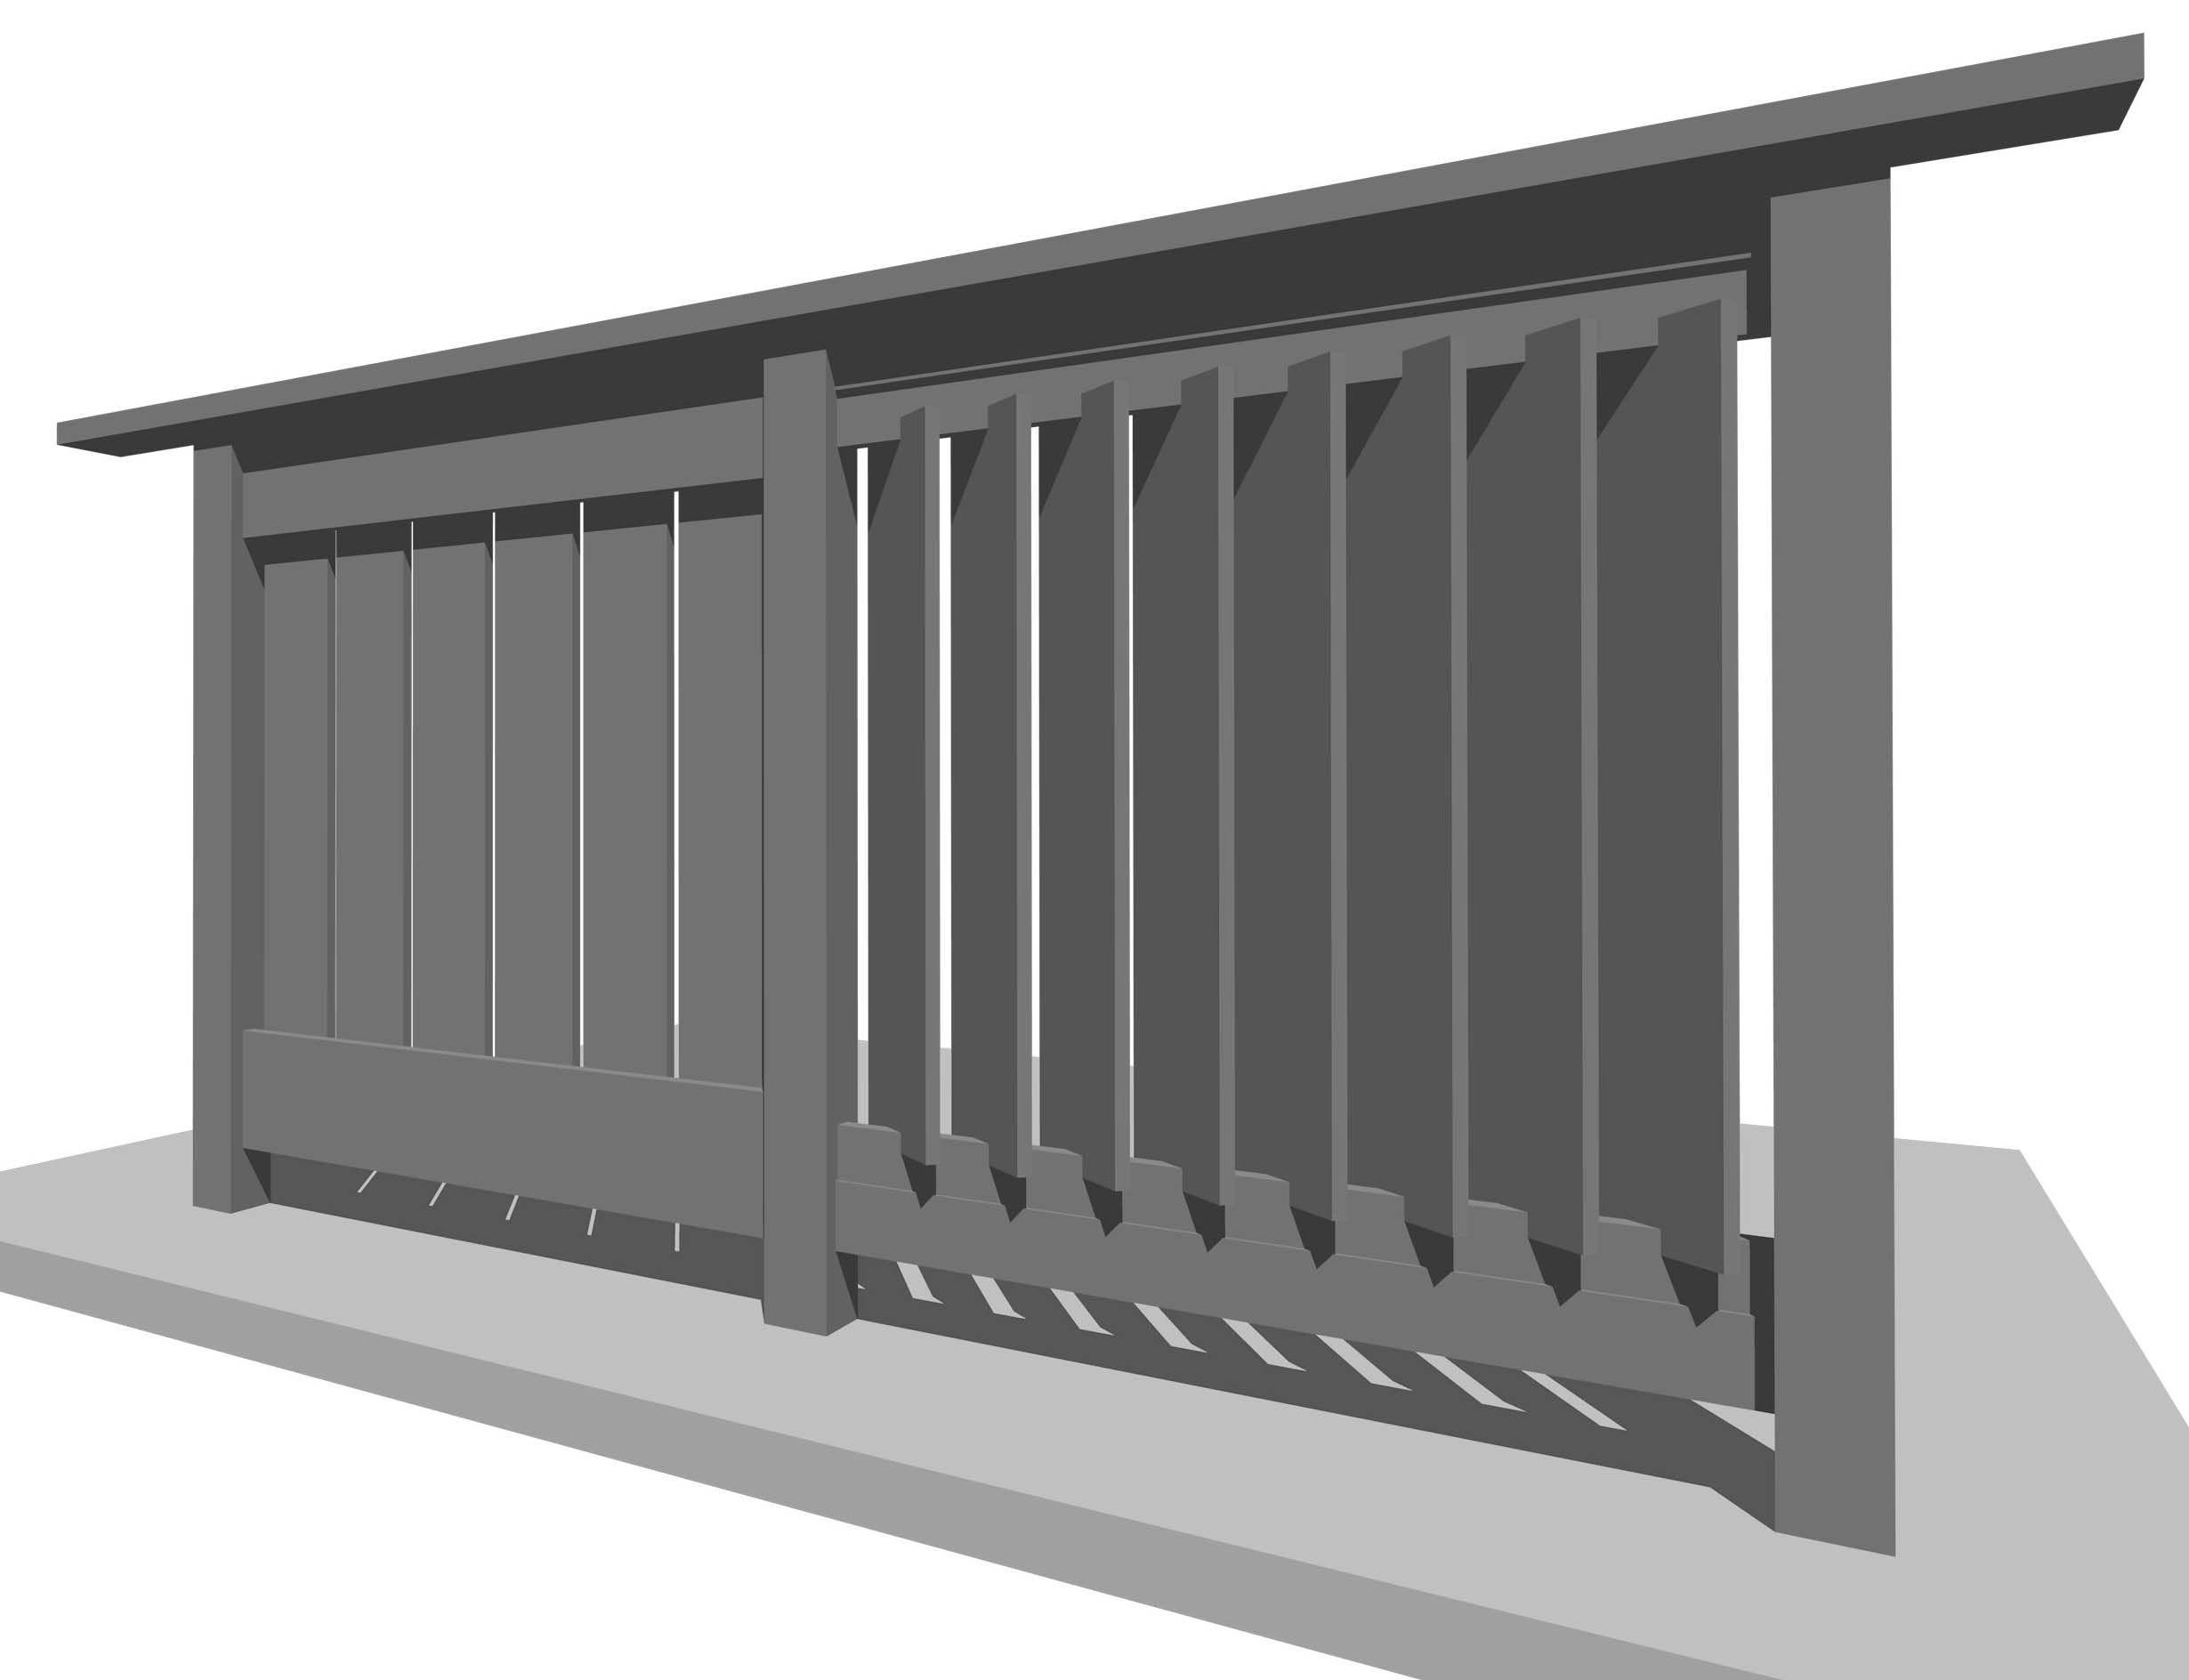 Best Wood Angled Fence Google Search Railing Design Deck 400 x 300